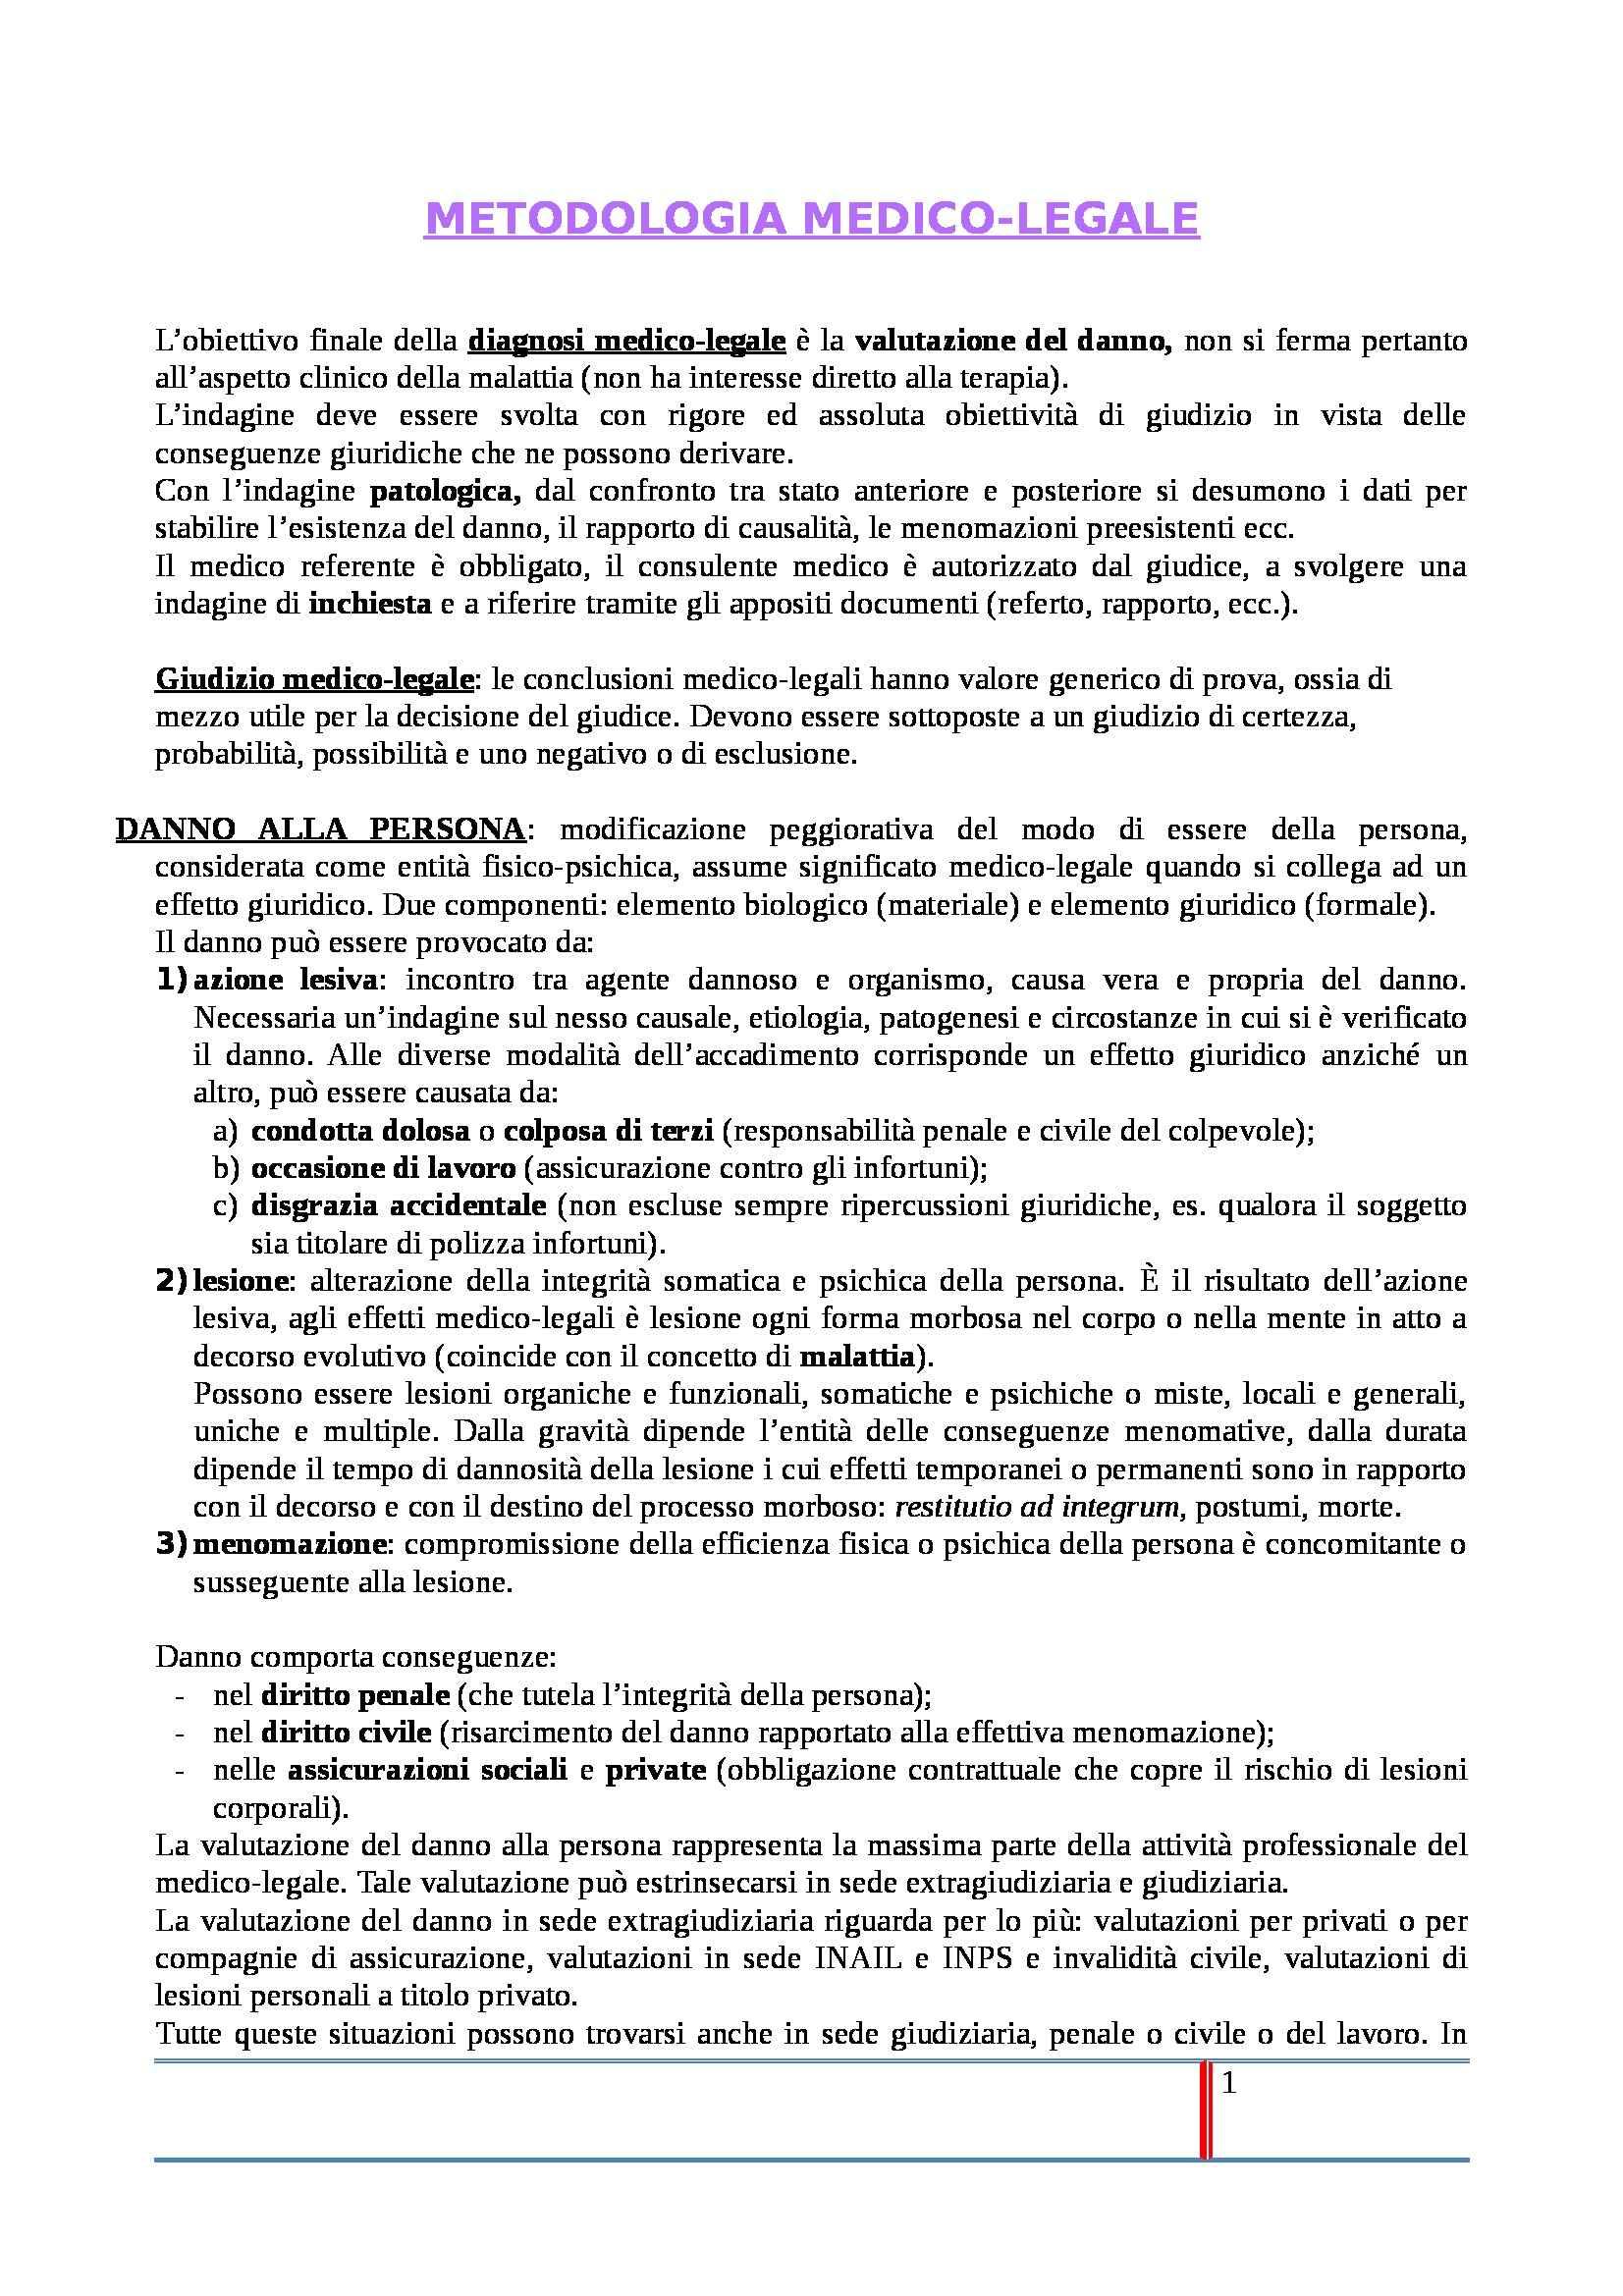 Medicina Legale - Appunti